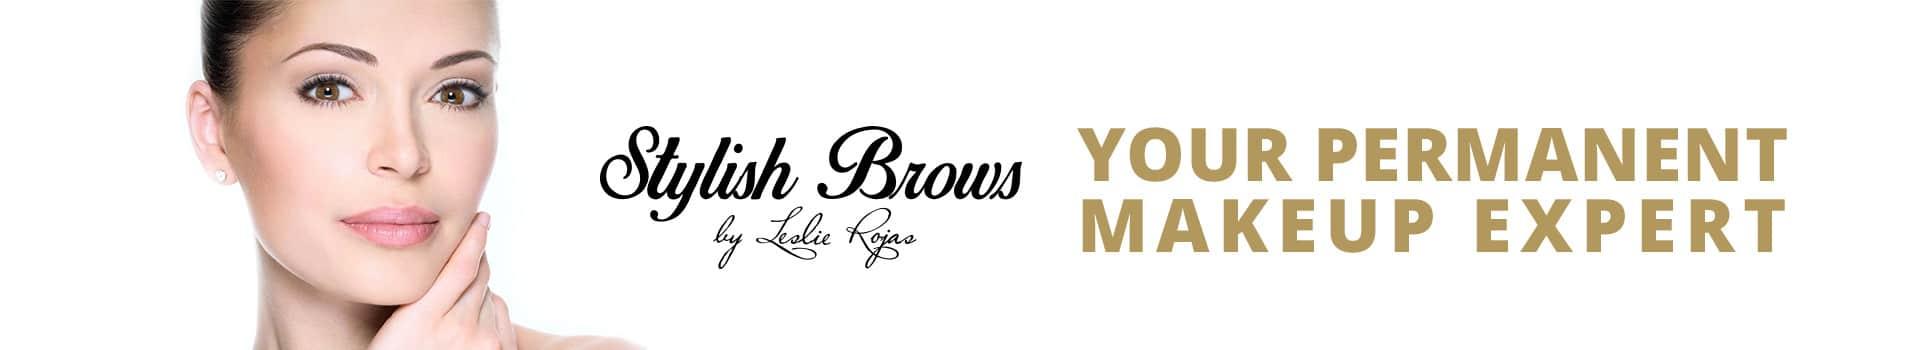 permanent-makeup-miami-weston-stylish-brows-desktop